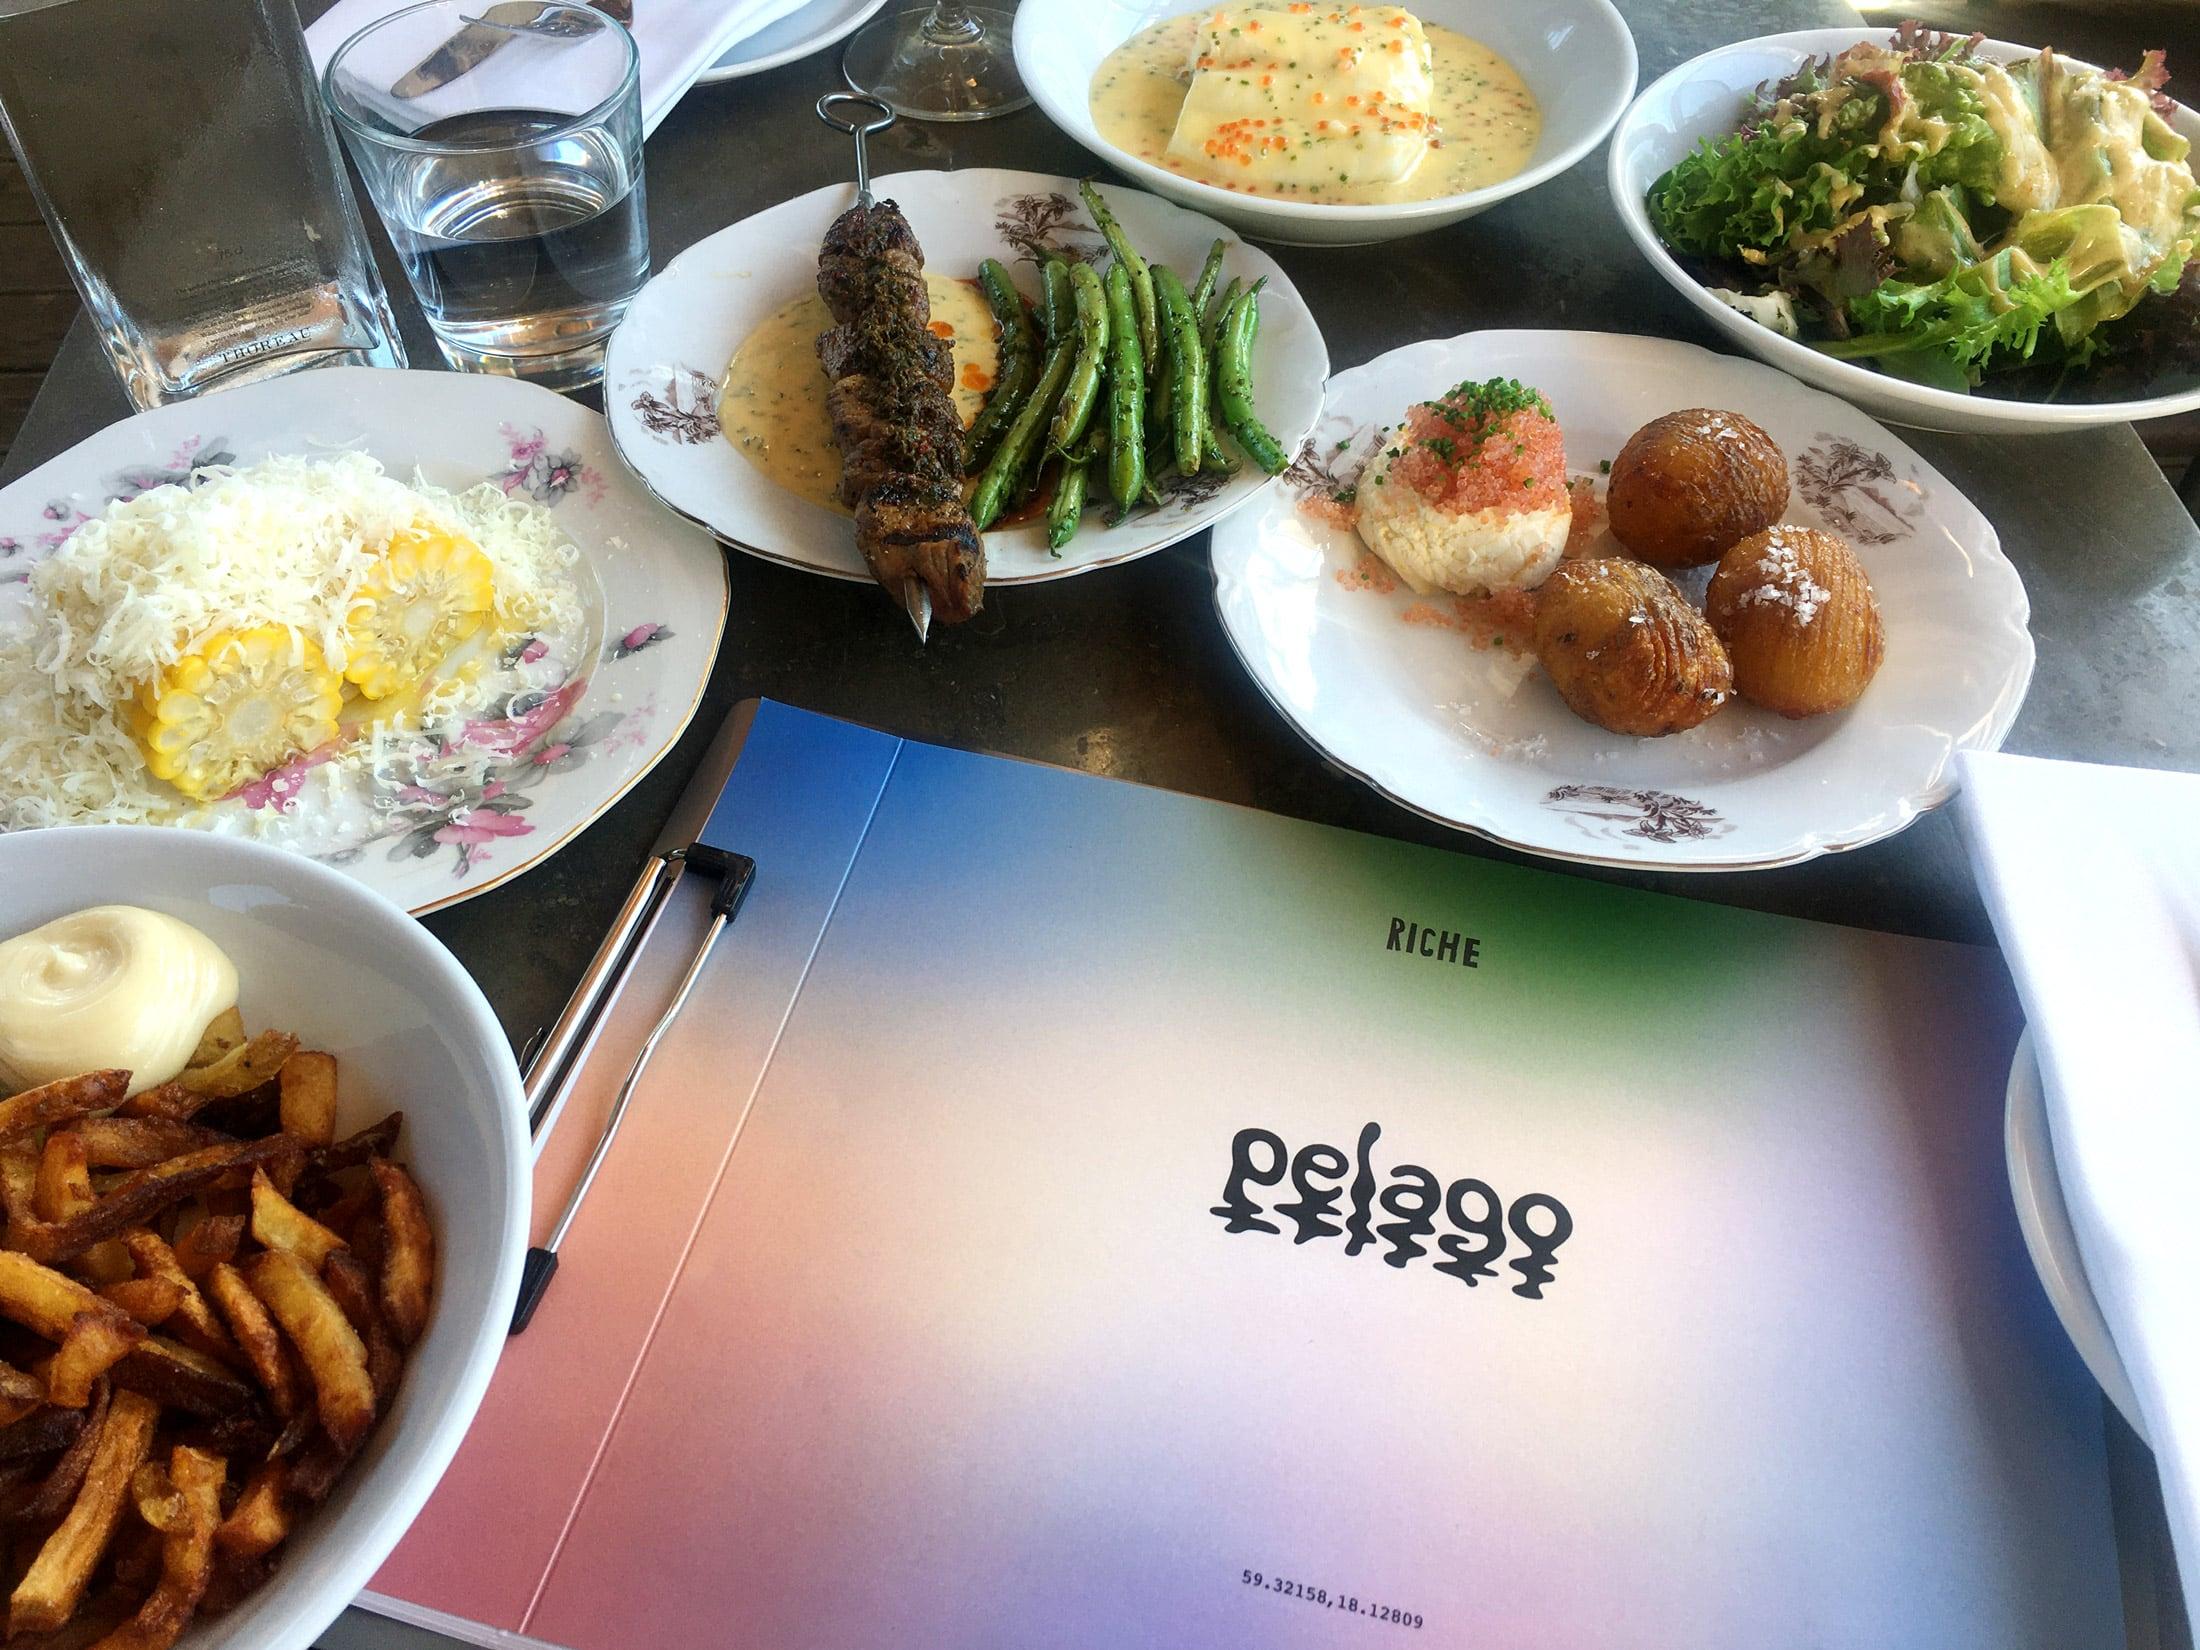 Behind the Amusement Park – Pelago menu